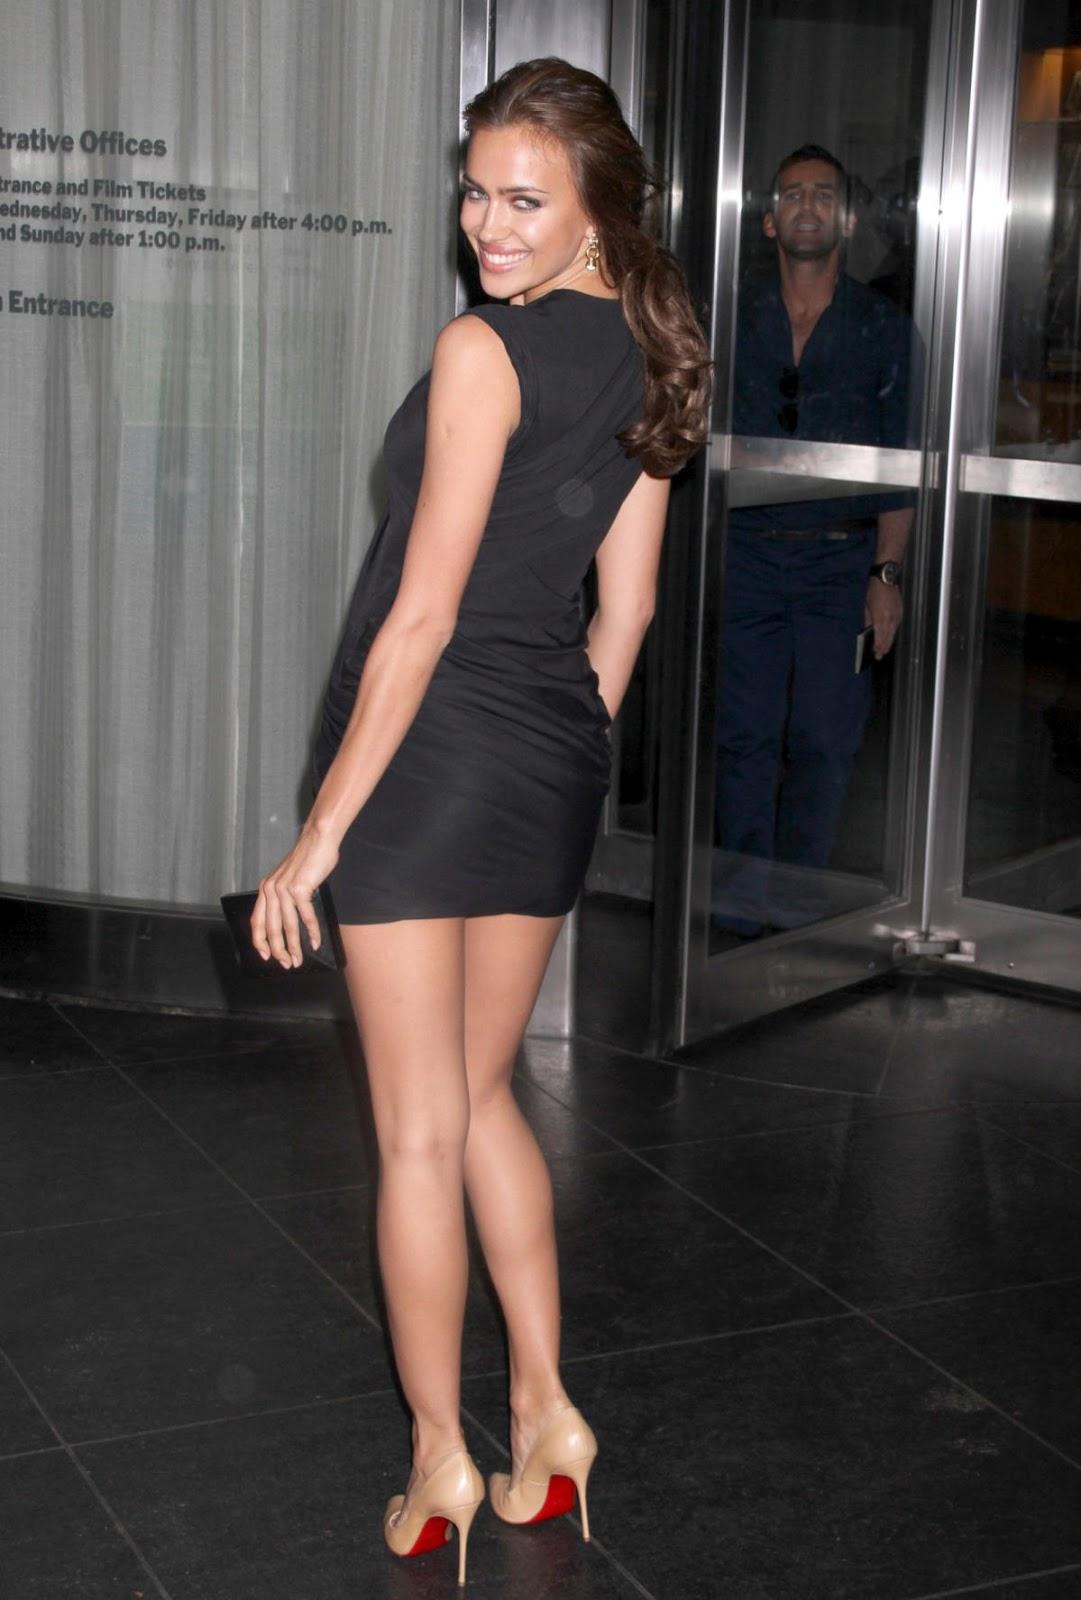 - WOMENs muscular ATHLETIC LEGS especially CALVES - daily